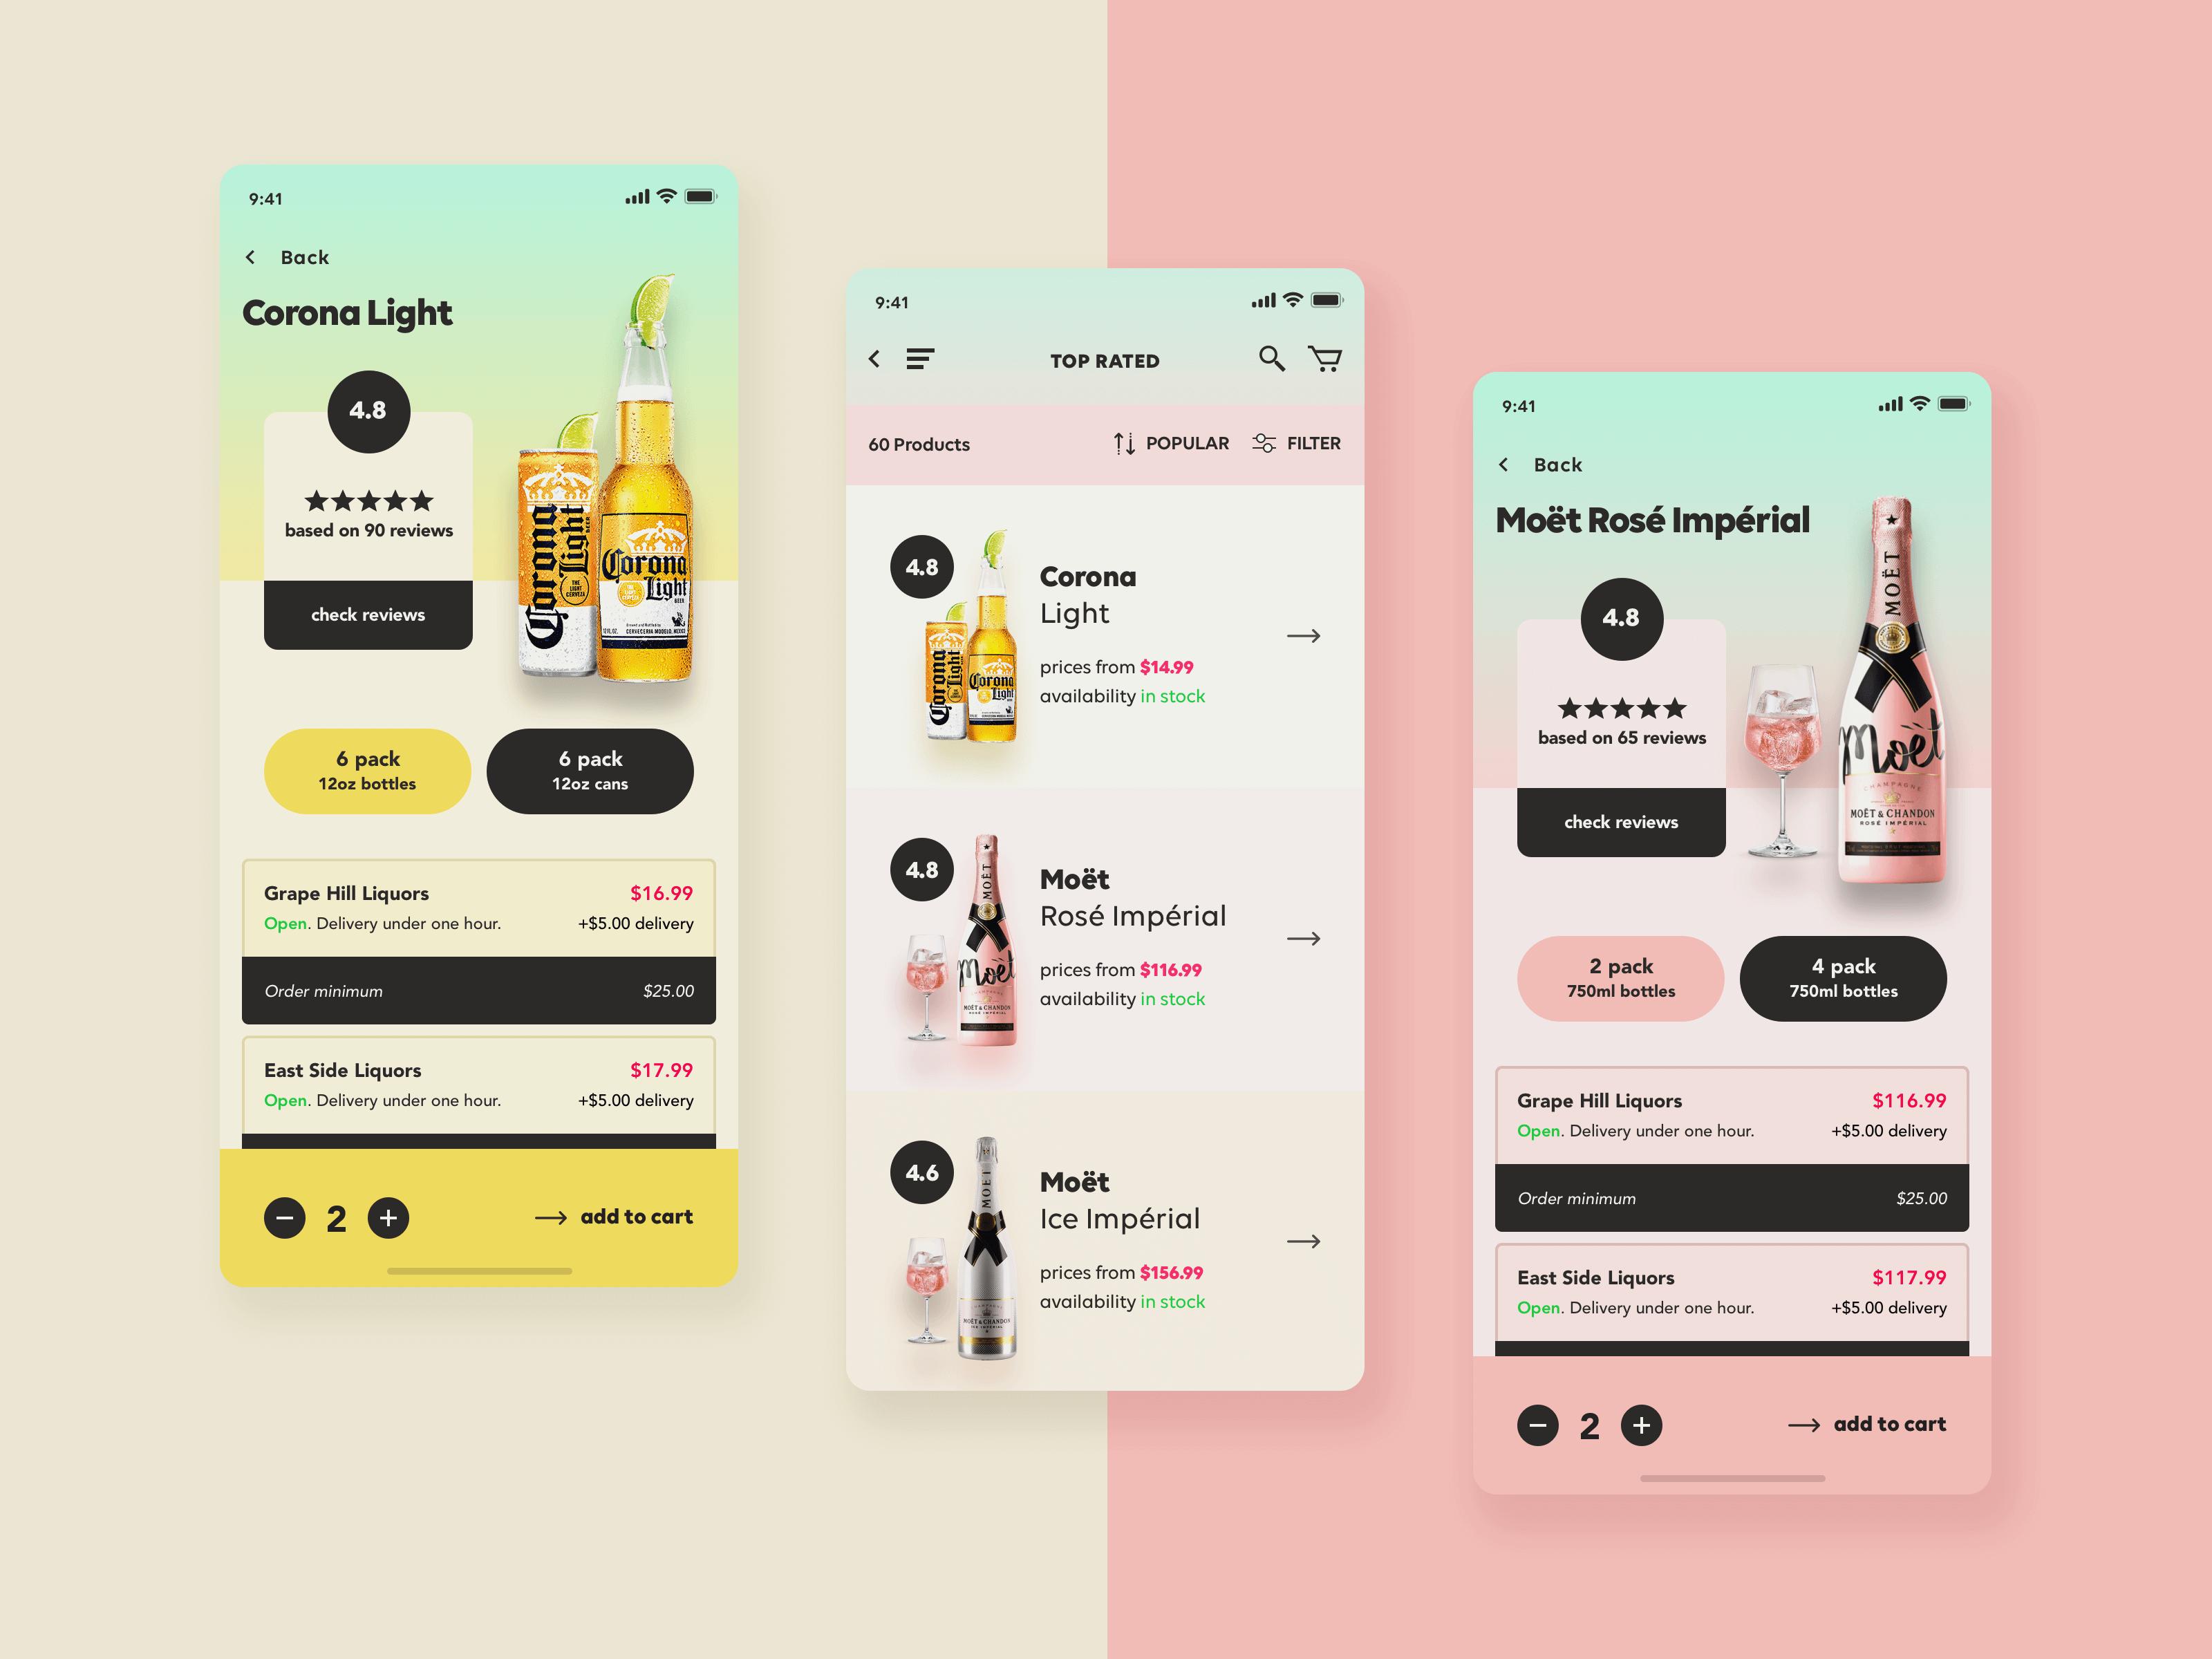 MBD-Liquor-Beer-Wine-Marketplace-iOS-App-2-1